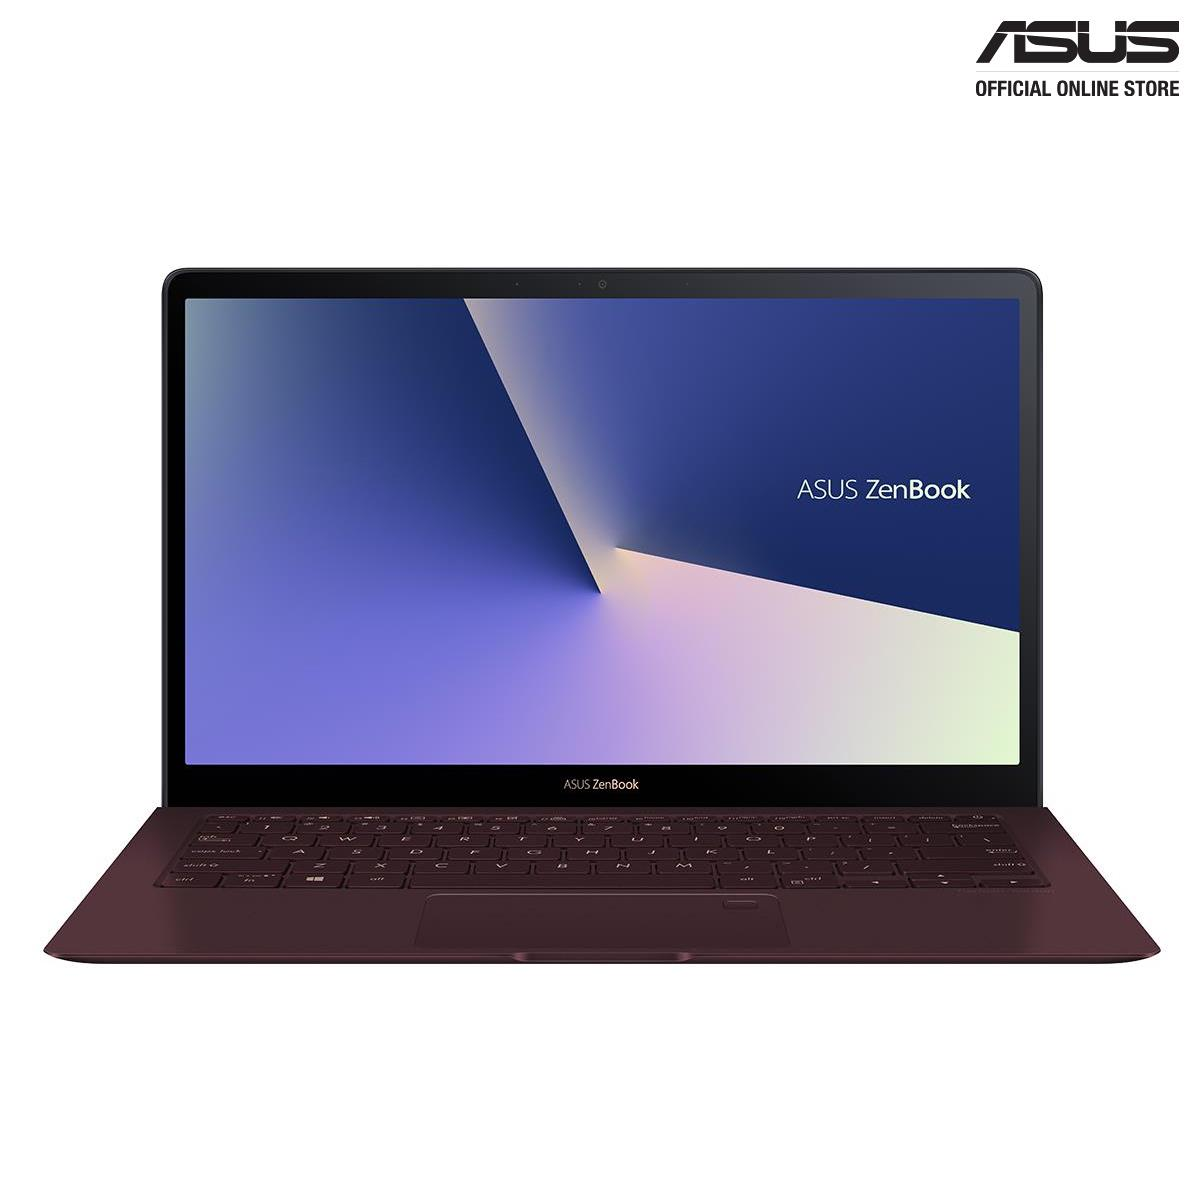 ASUS ZenBook S UX391UA-ET084T (Burgundy Red)